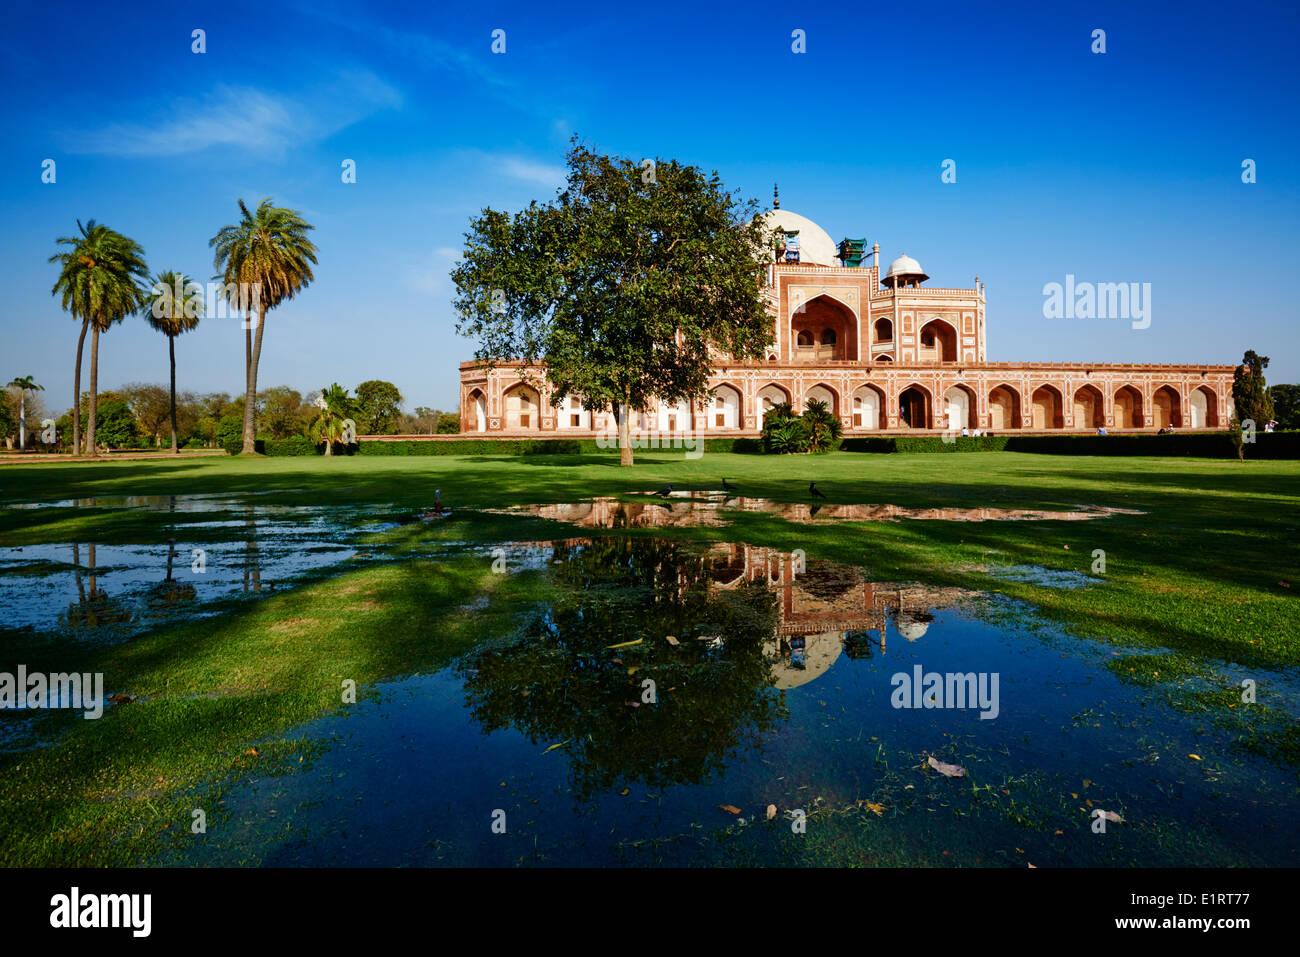 L'Inde, Delhi, Mausolée Humayun, Unesco world heritage Banque D'Images